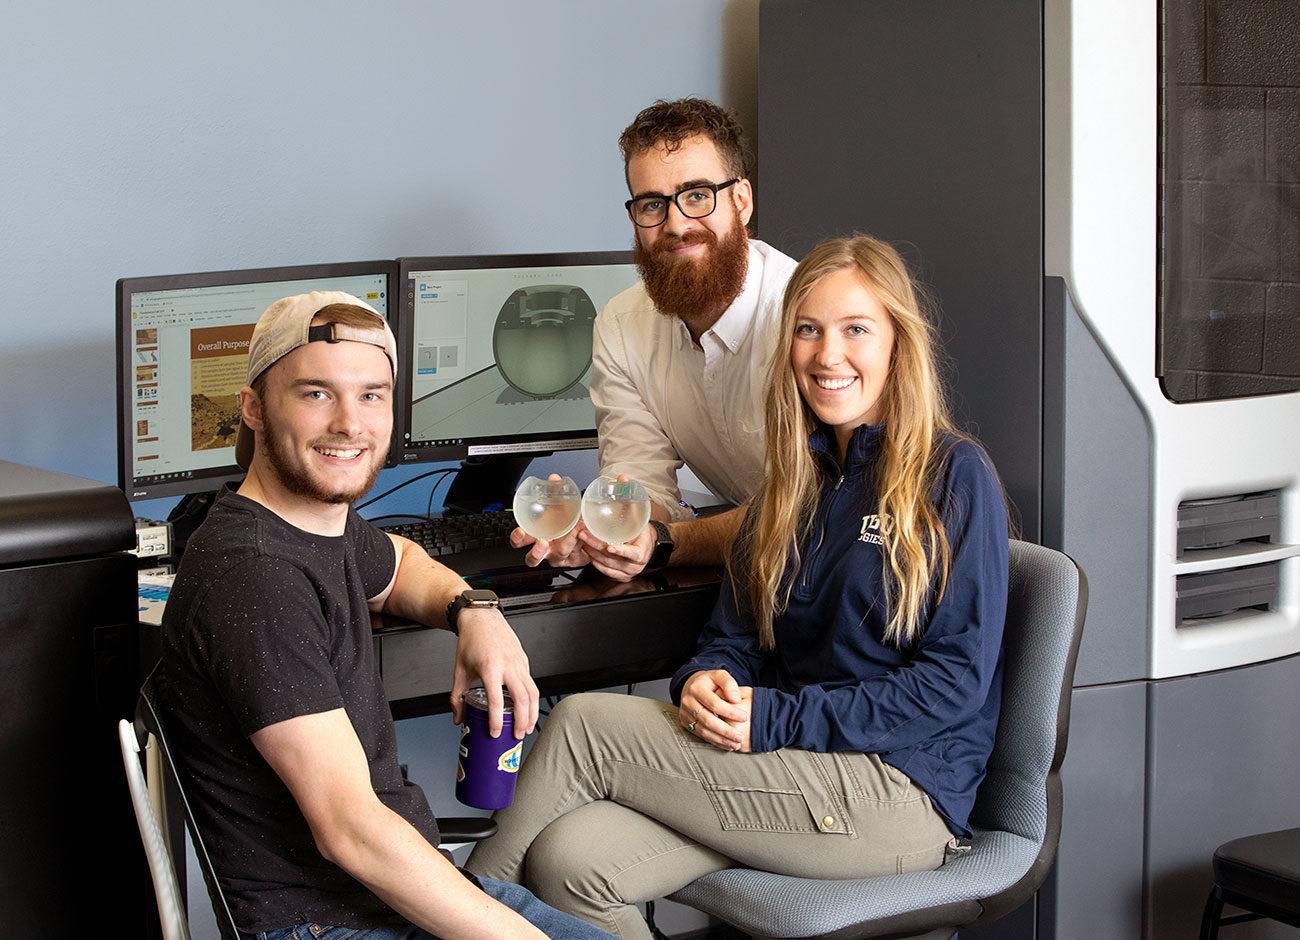 three students display their handheld device to help NASA detect life on Mars.